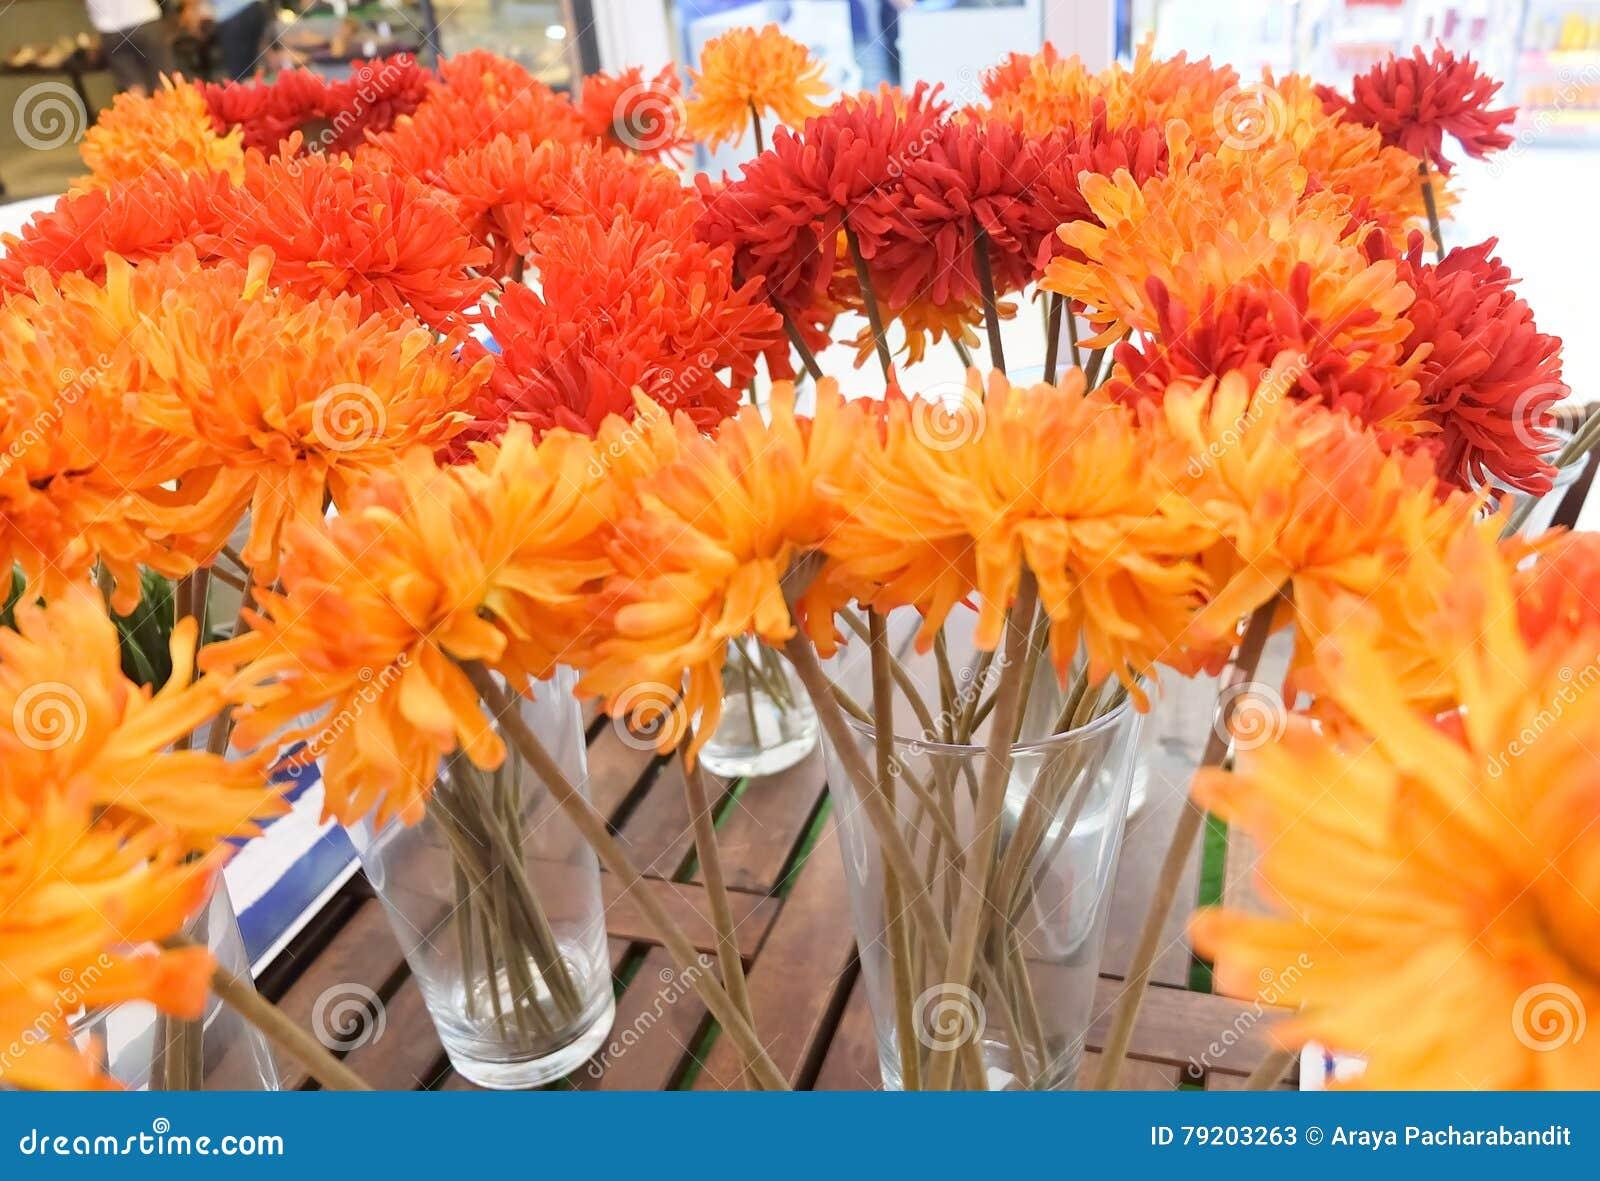 Orange artificial gerbera flowers in glass vase stock image orange artificial gerbera flowers in glass vase reviewsmspy